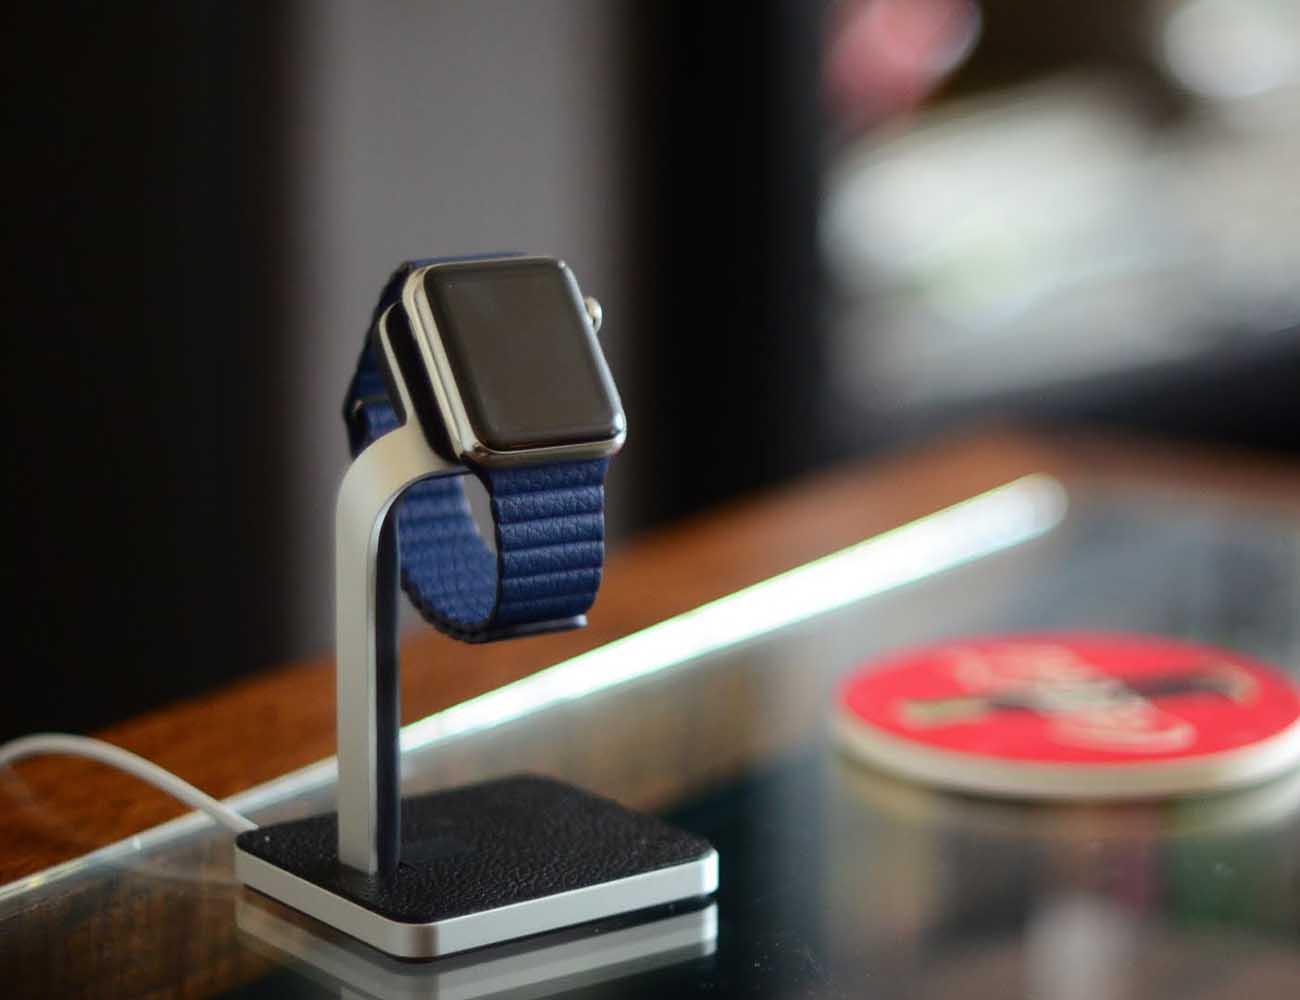 Mophie Apple Watch Charging Dock